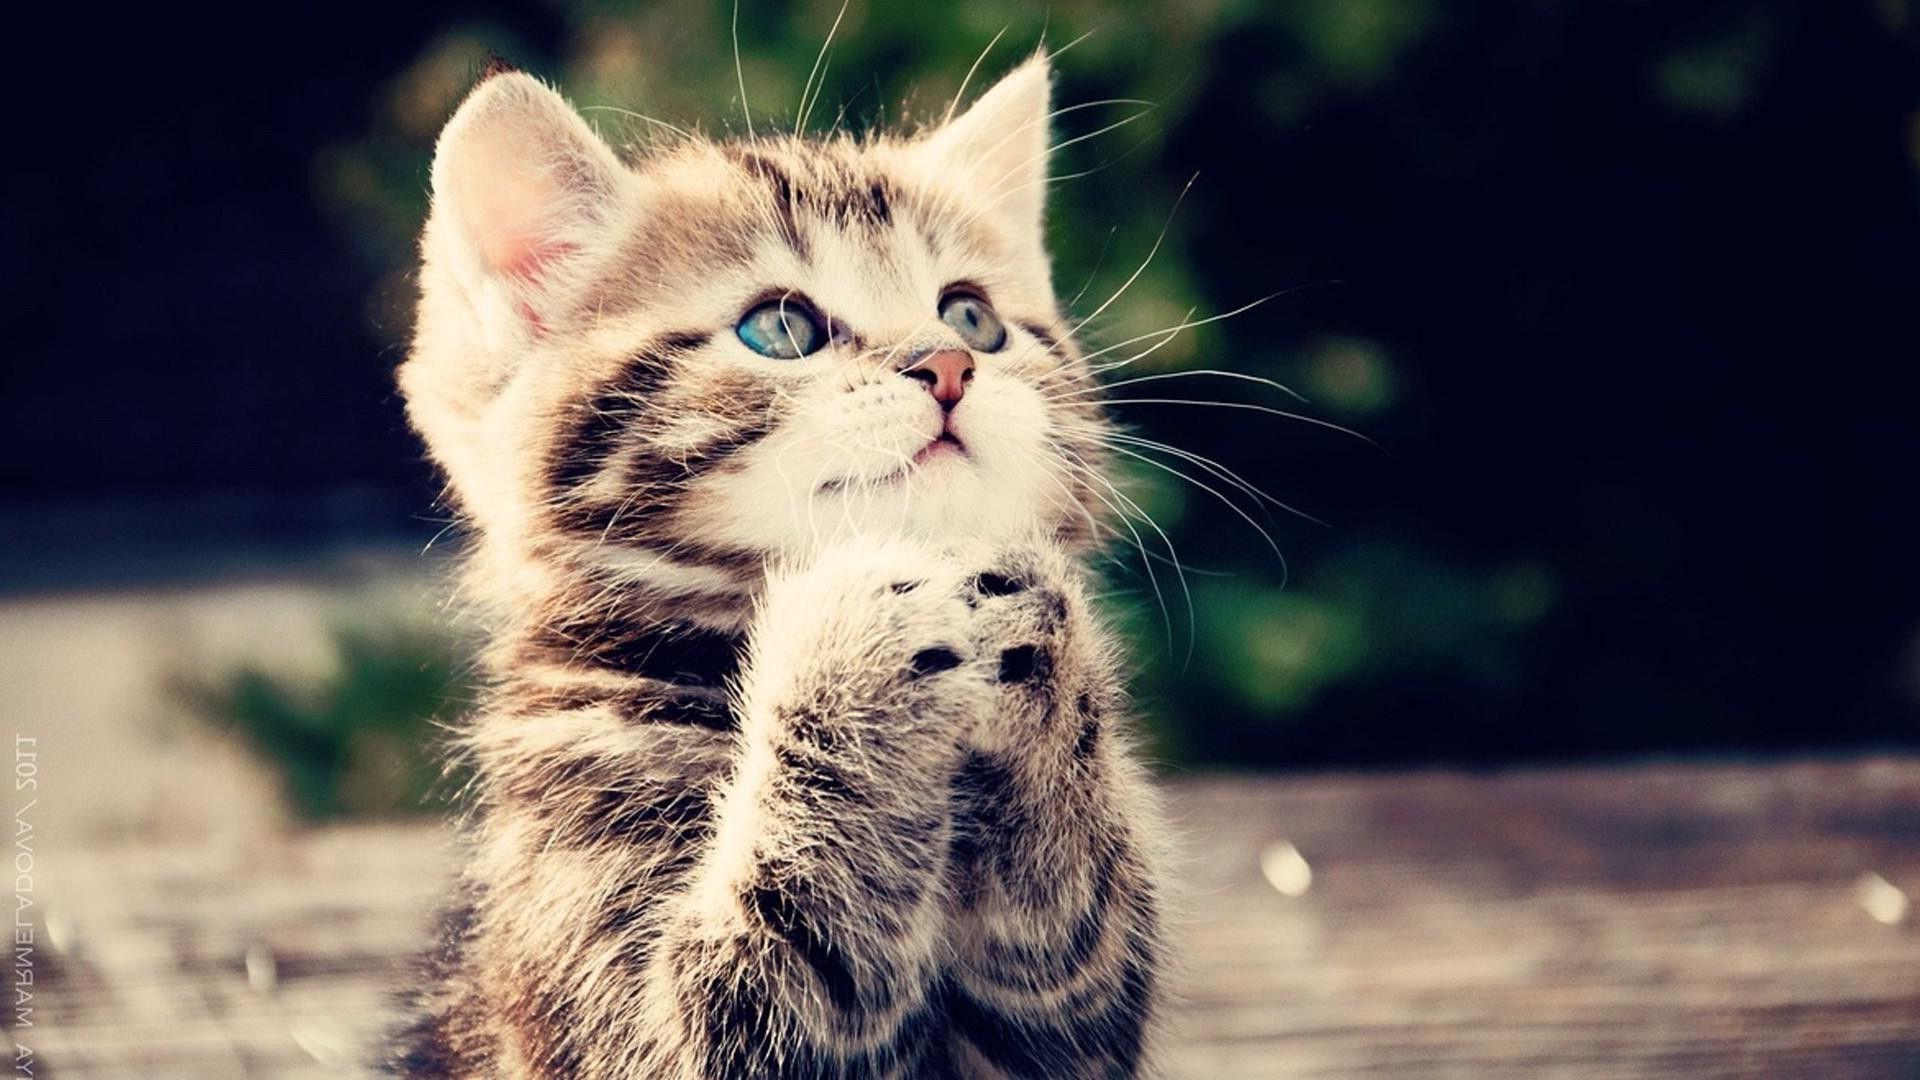 Cute Cat Google Search Kittens Cutest Cute Animals Kitten